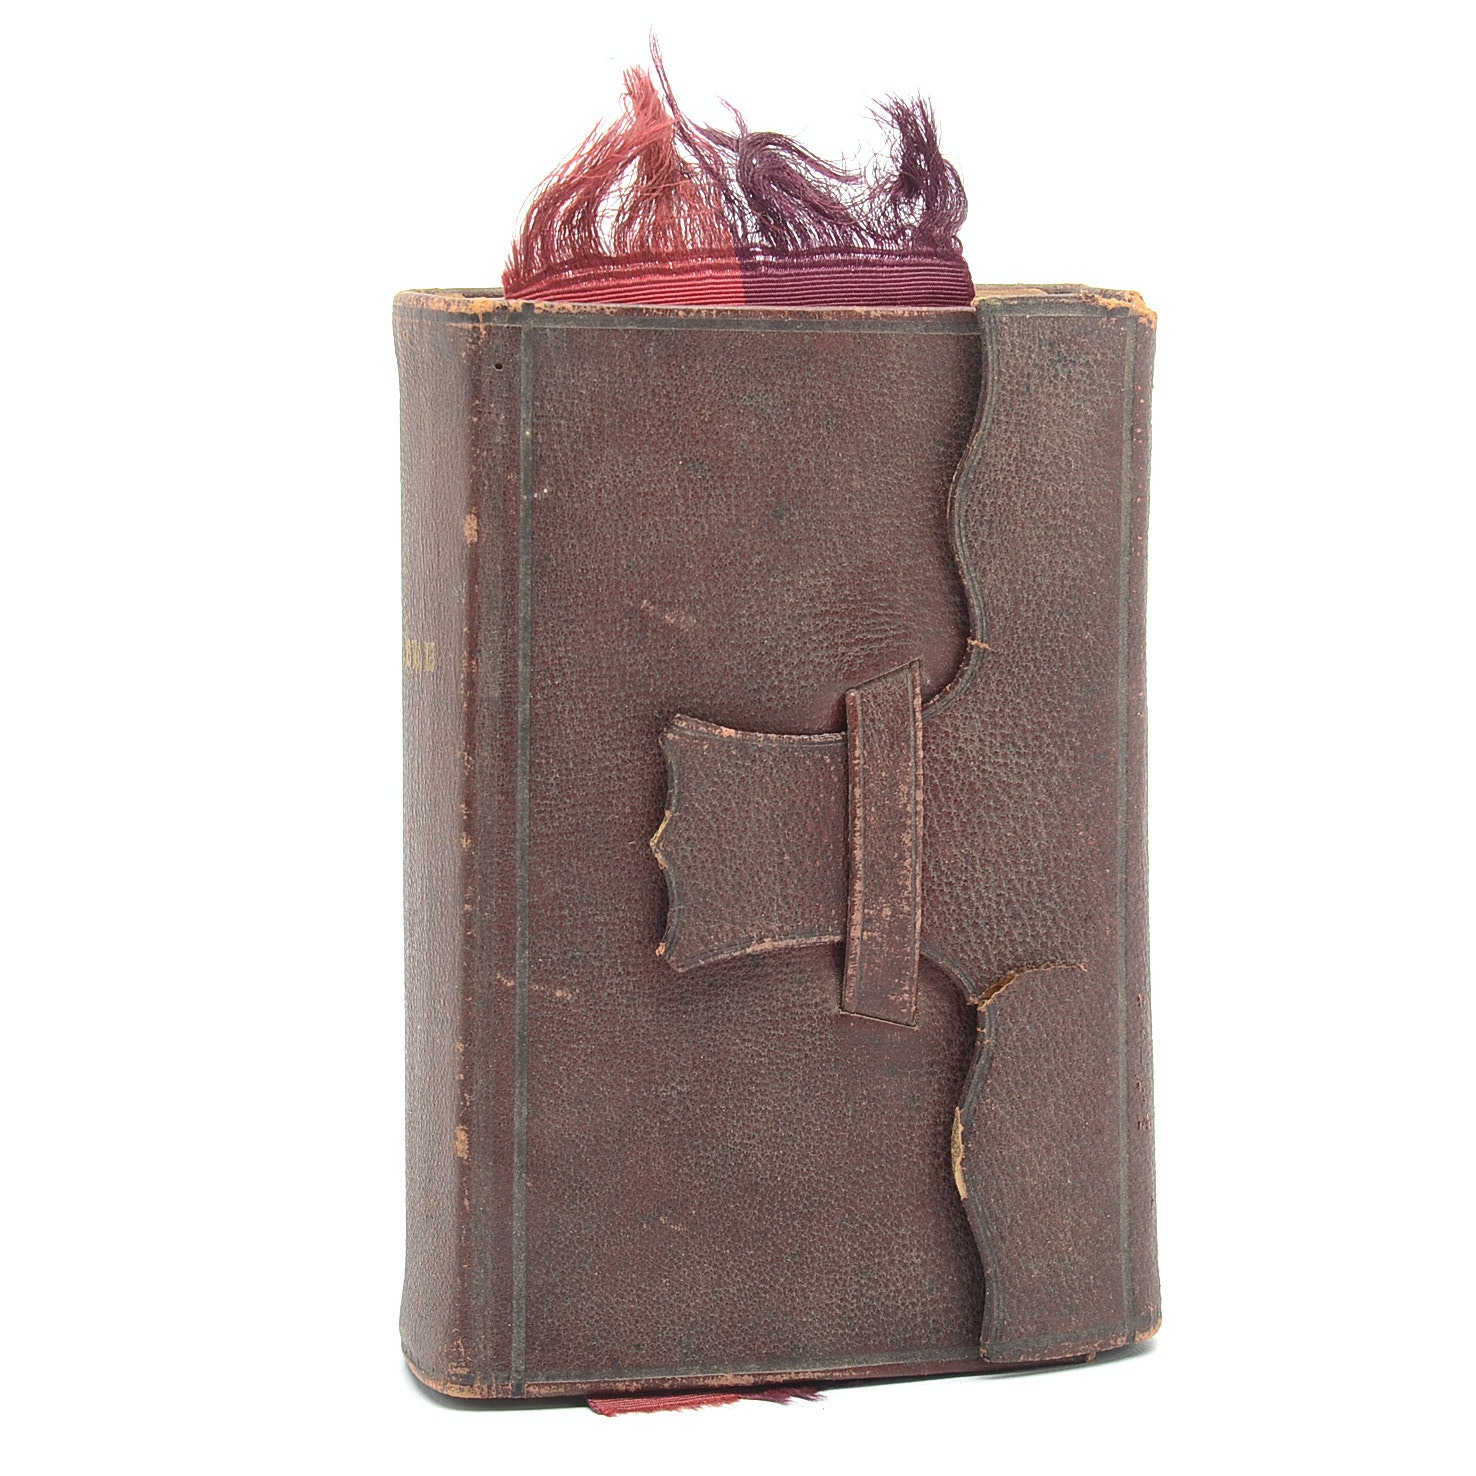 Civil War Era Pocket-Sized Bible With Inscription